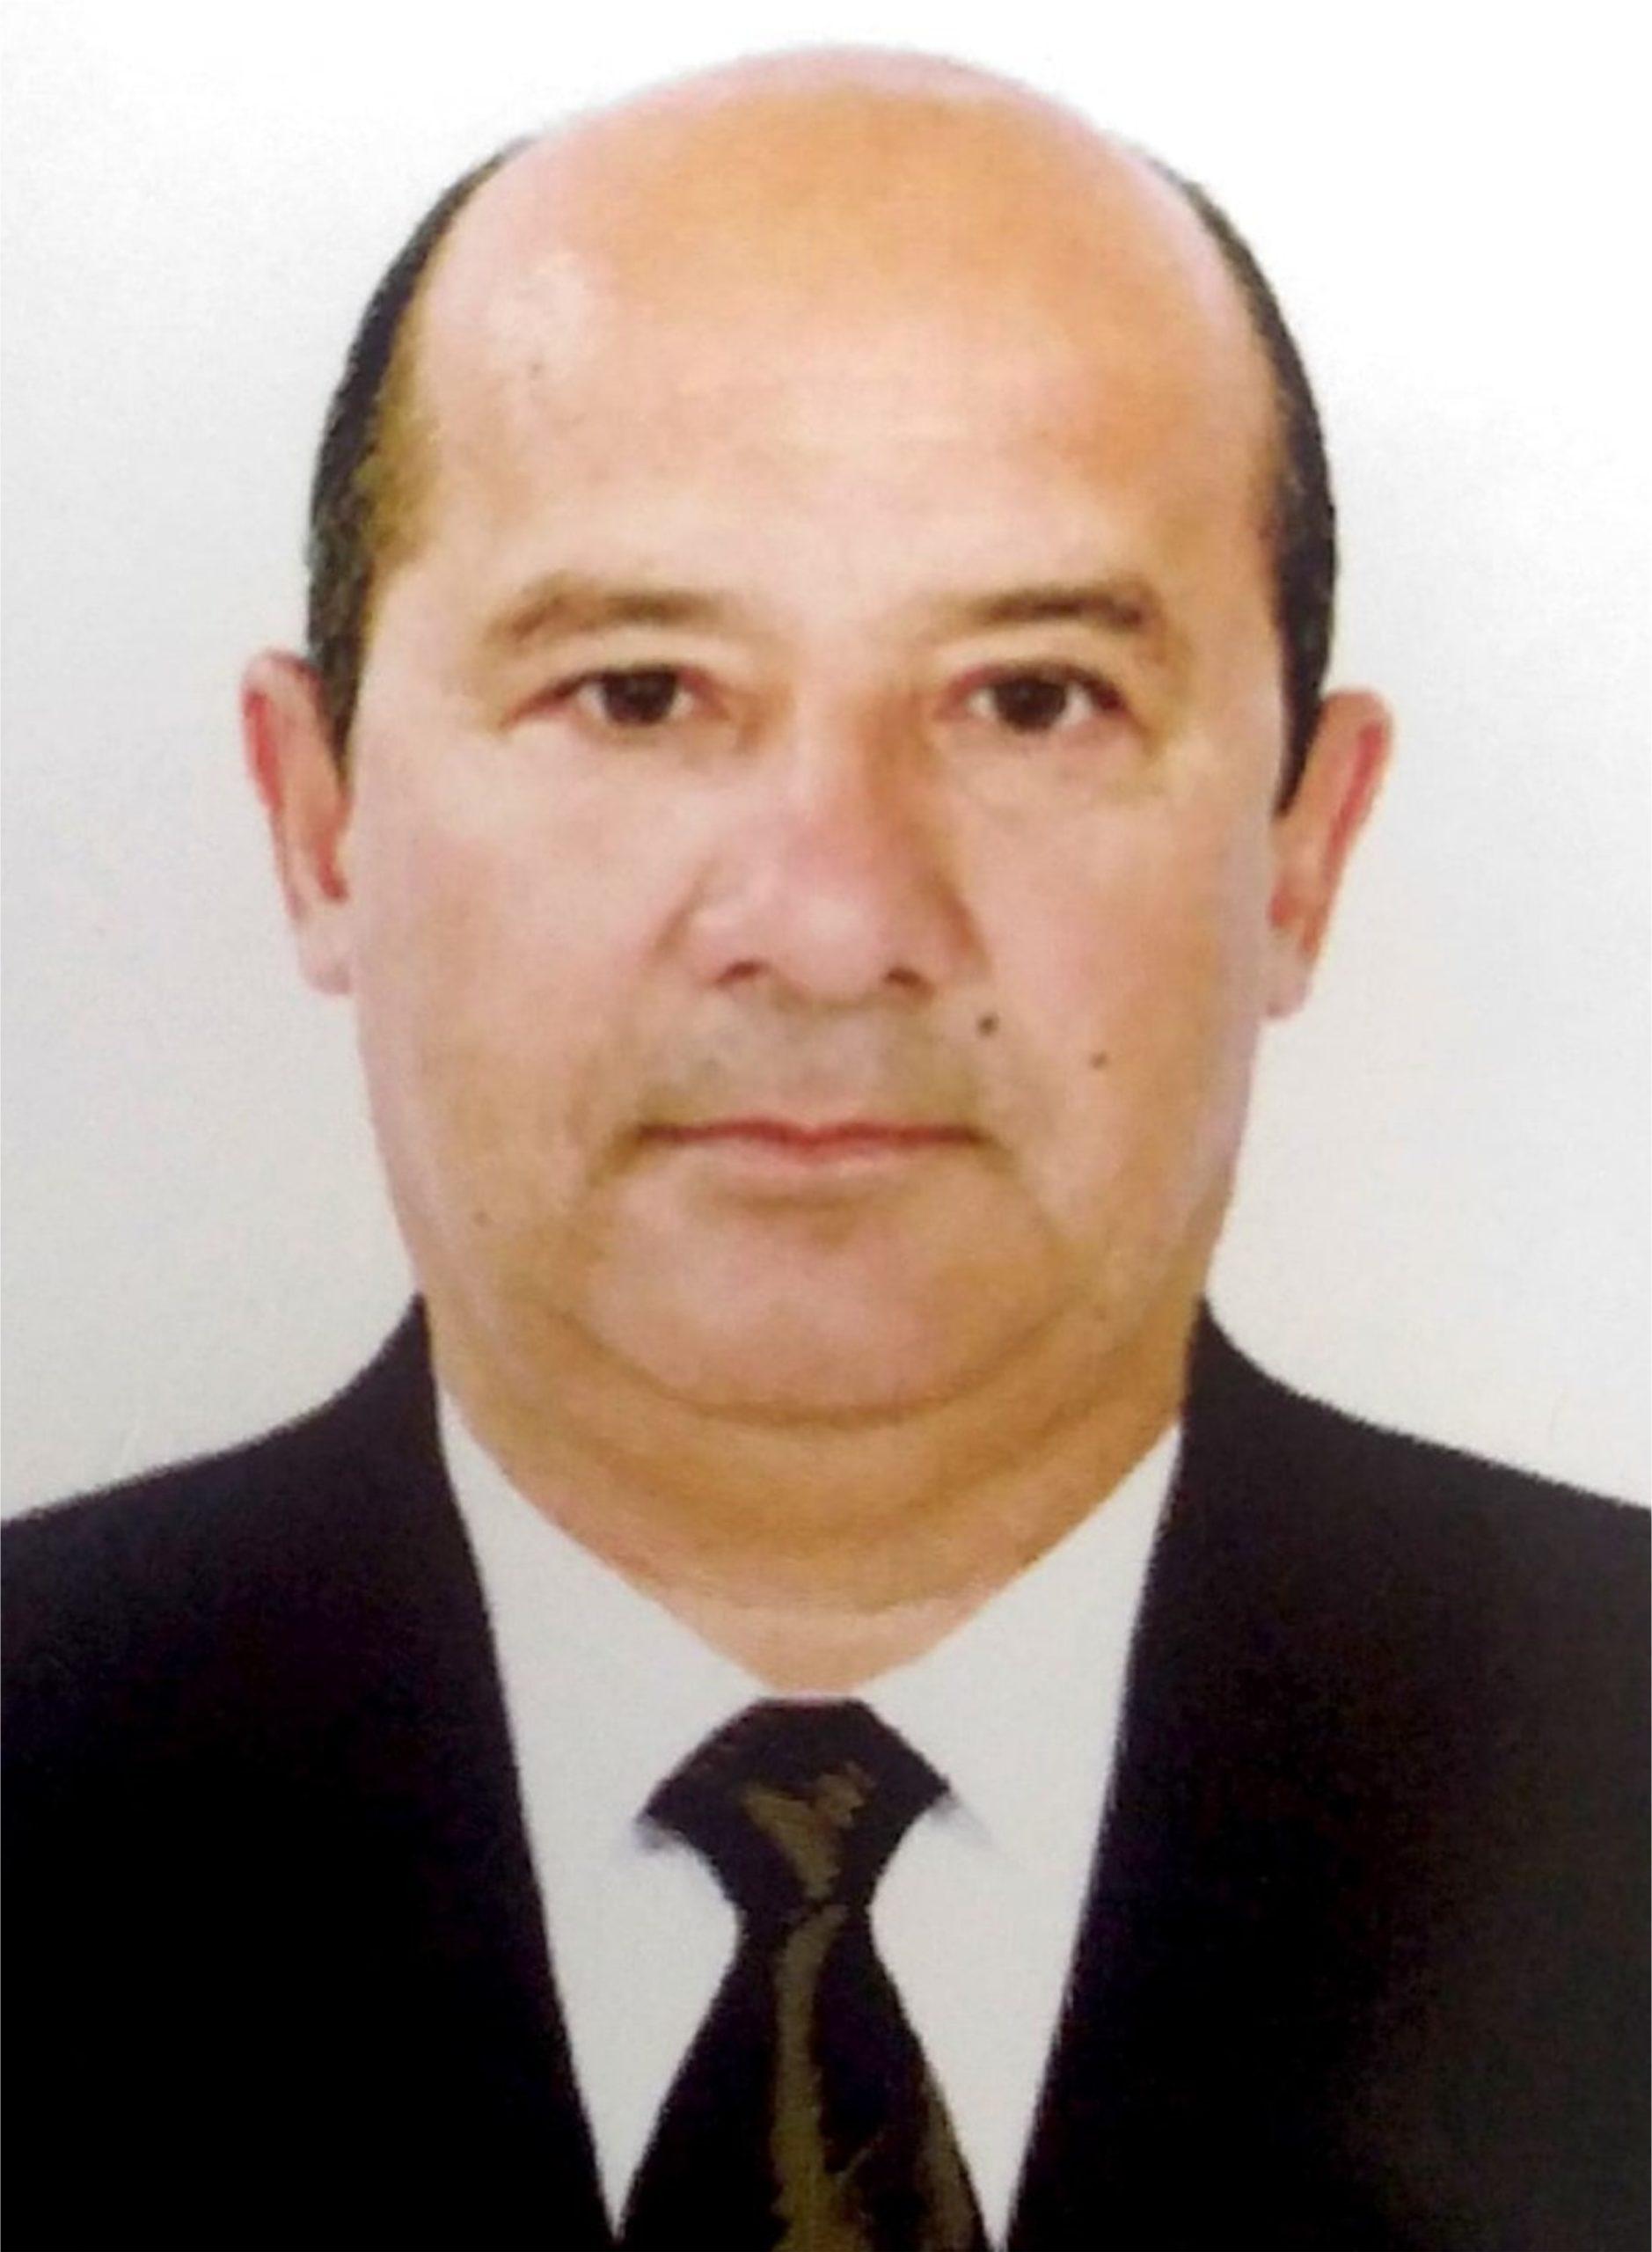 Imamqulov Baxtiyor Akramovich